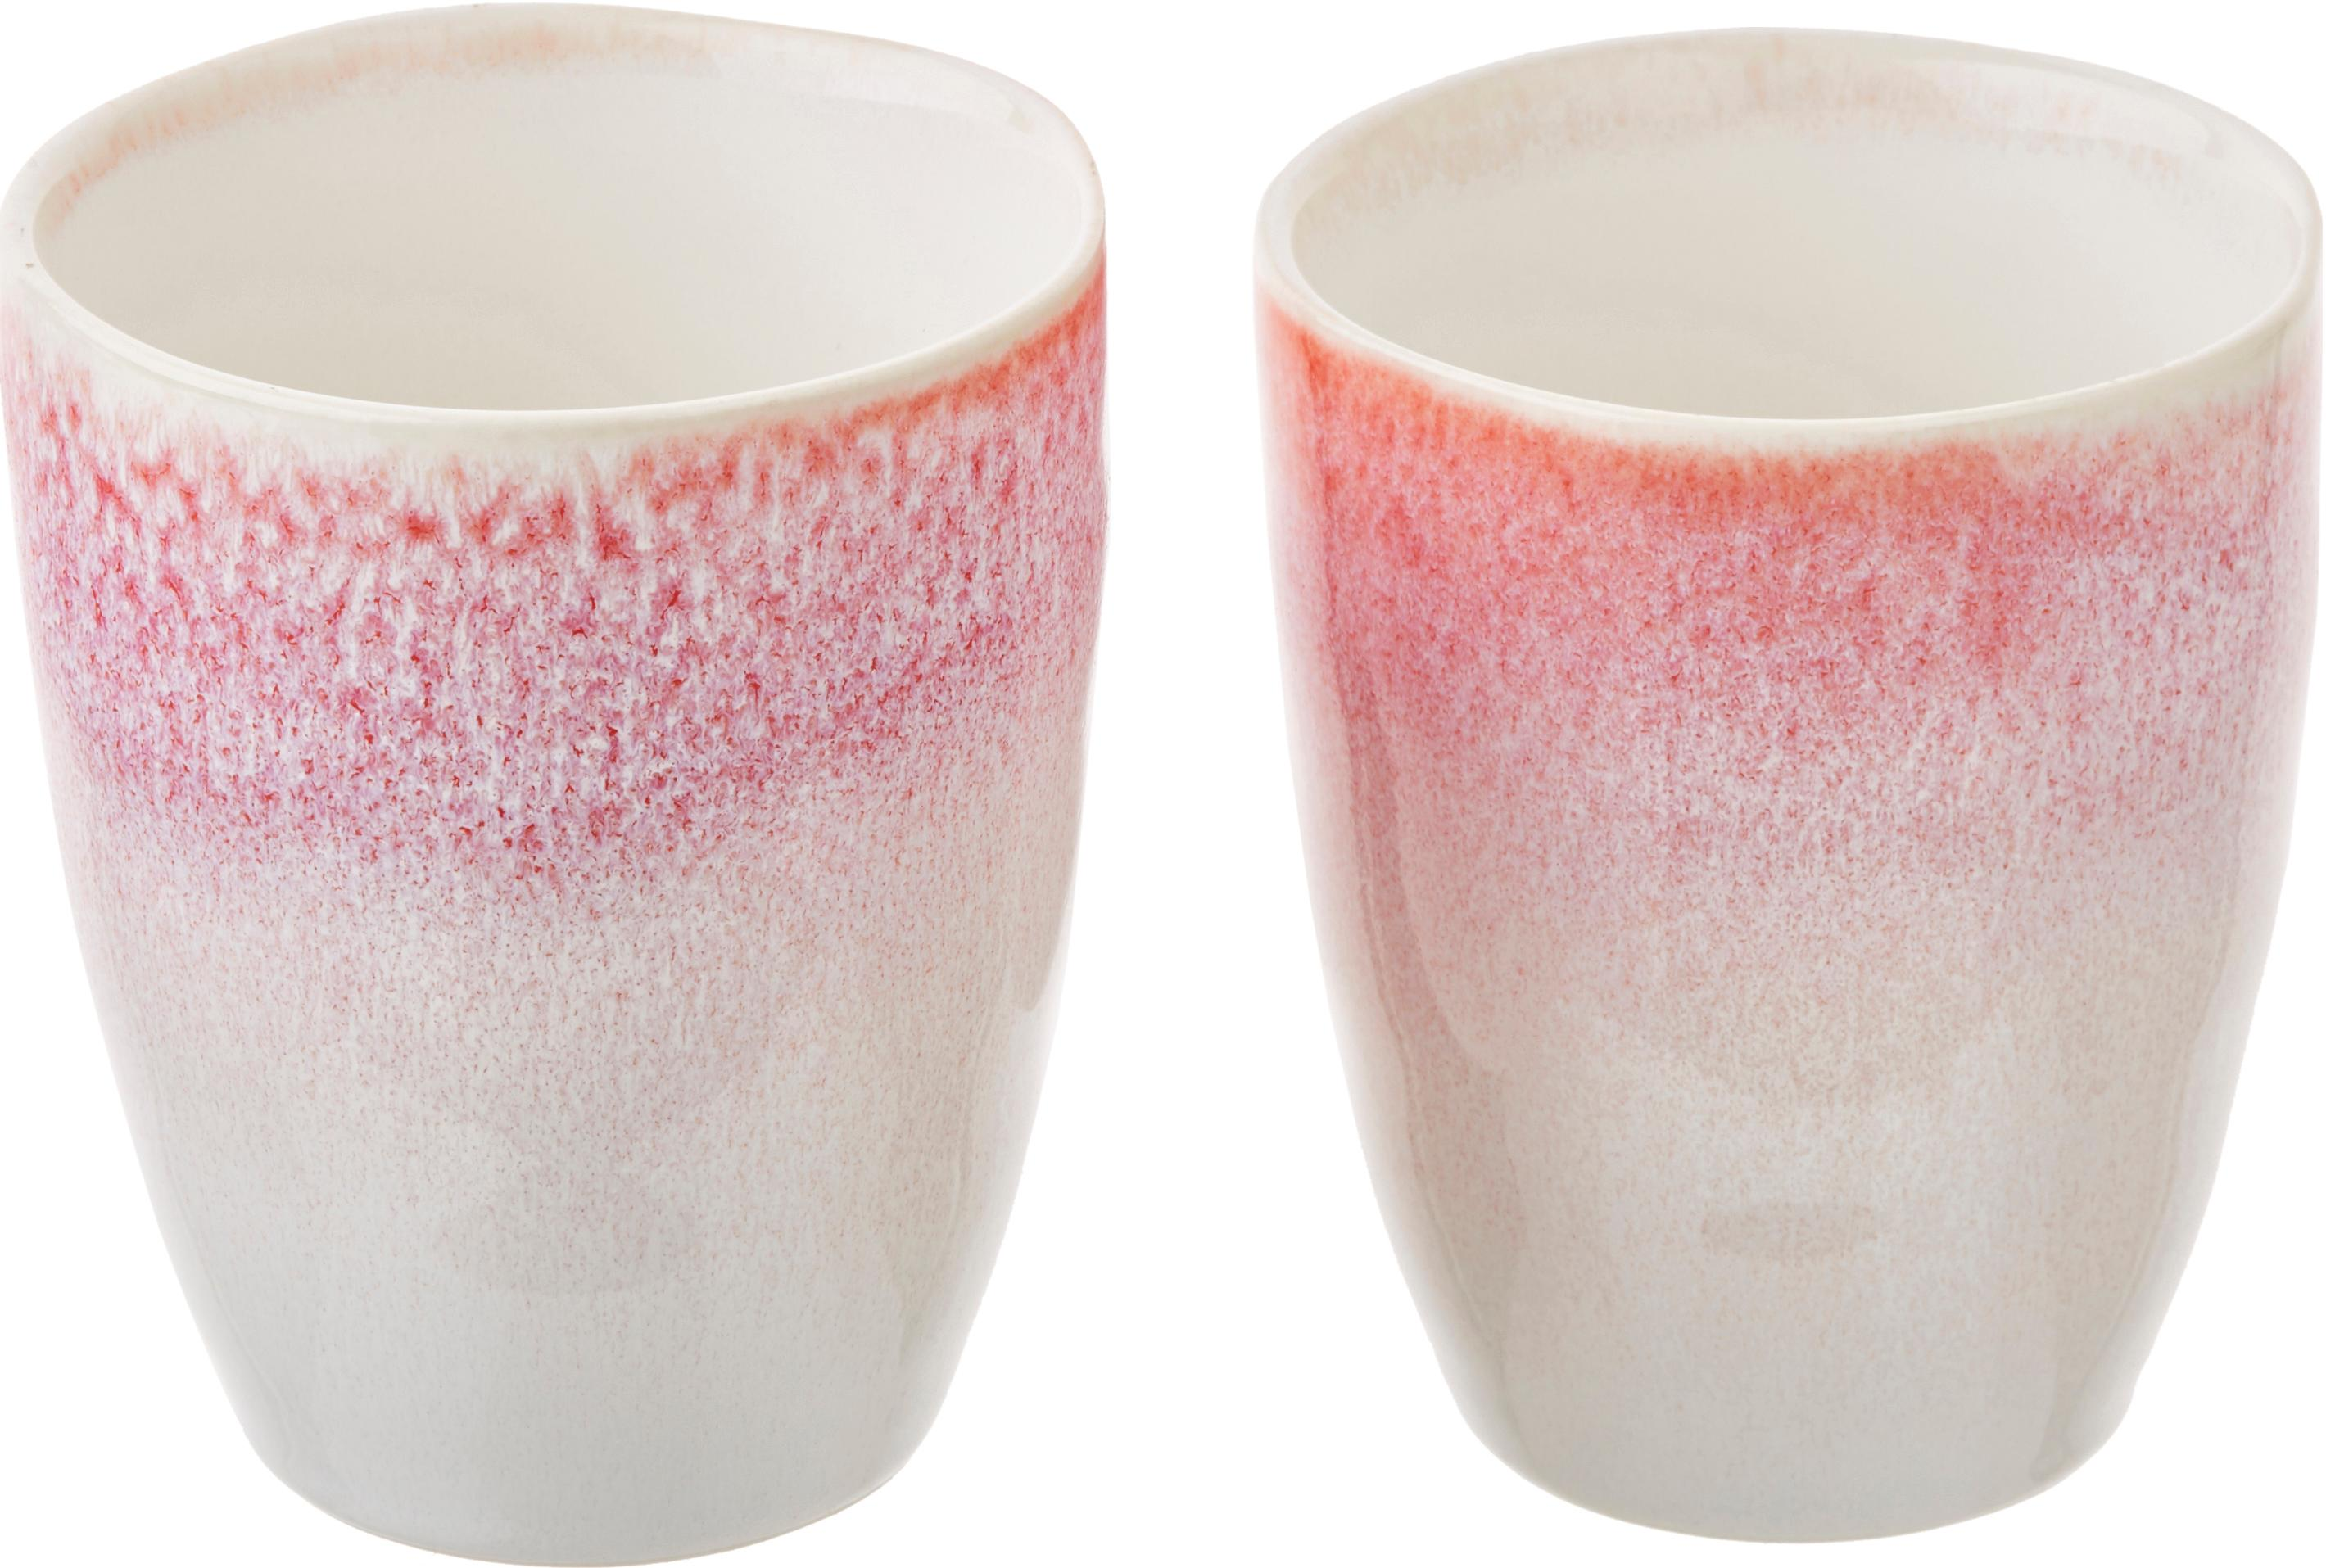 Tazas artesanales Amalia, 2uds., Cerámica, Rosa pálido, blanco crema, Ø 10 x Al 11 cm